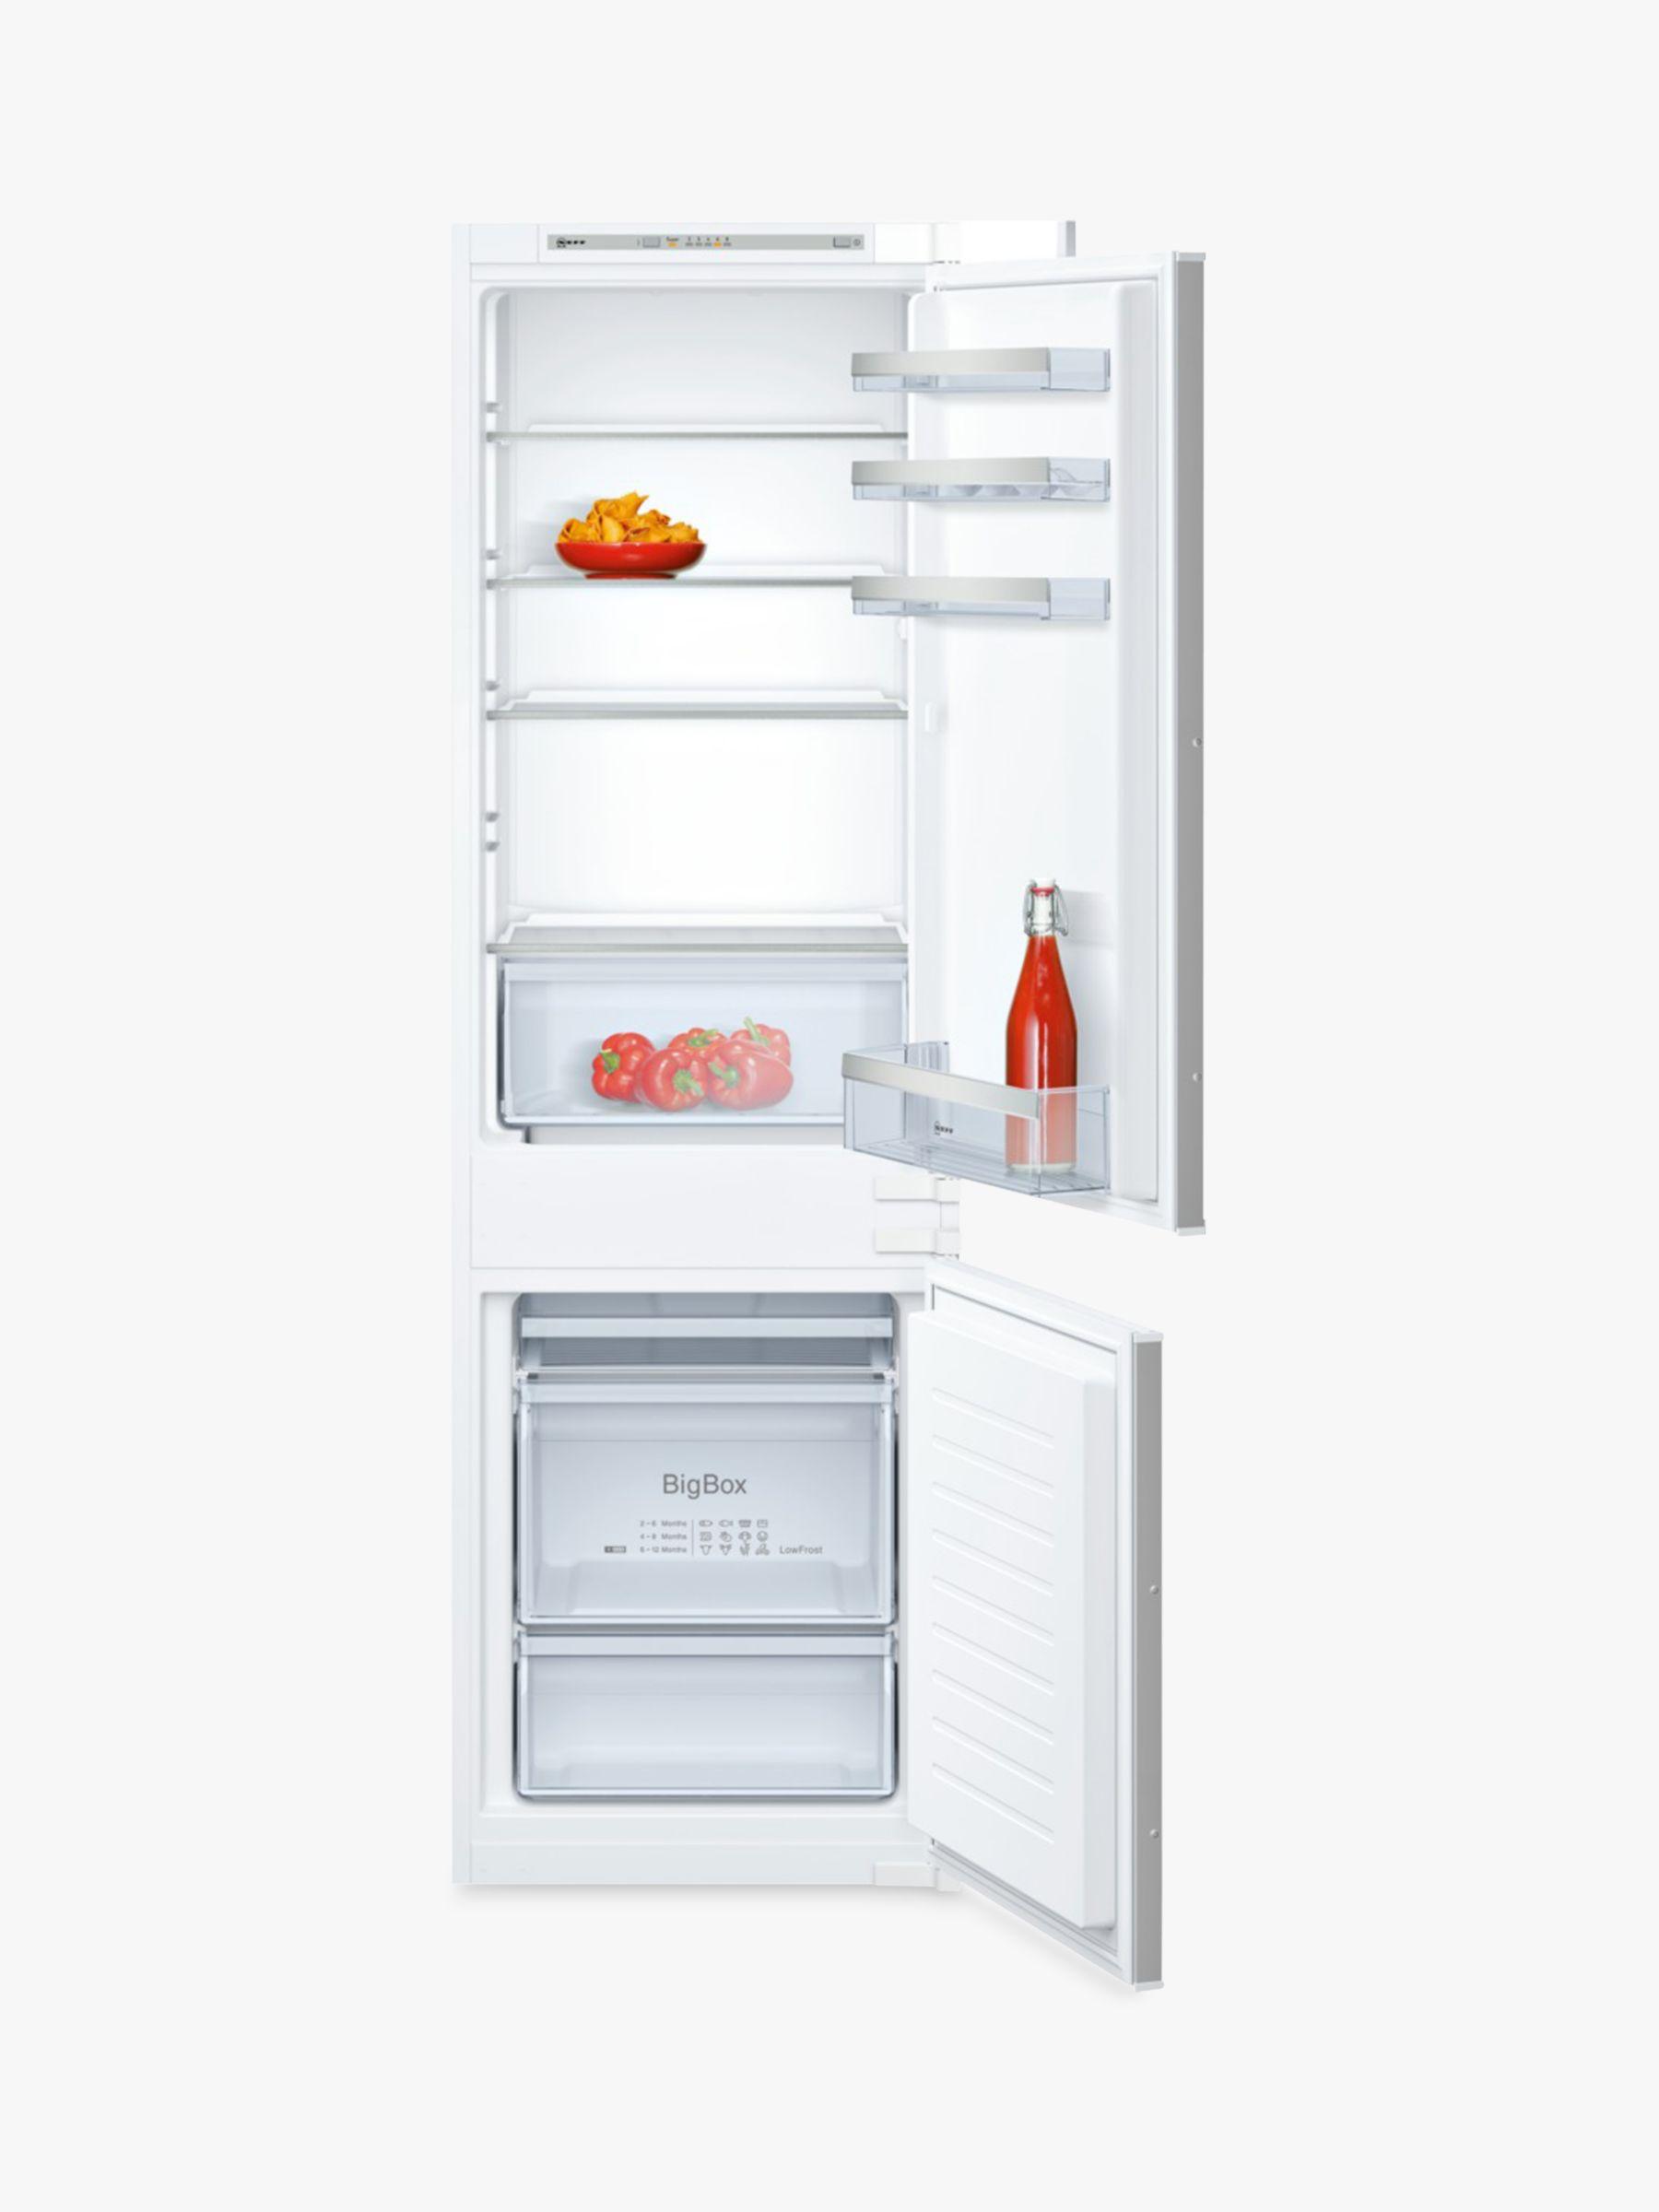 NEFF Neff KI5862S30G Integrated Fridge Freezer, A++ Energy Rating, 54cm Wide